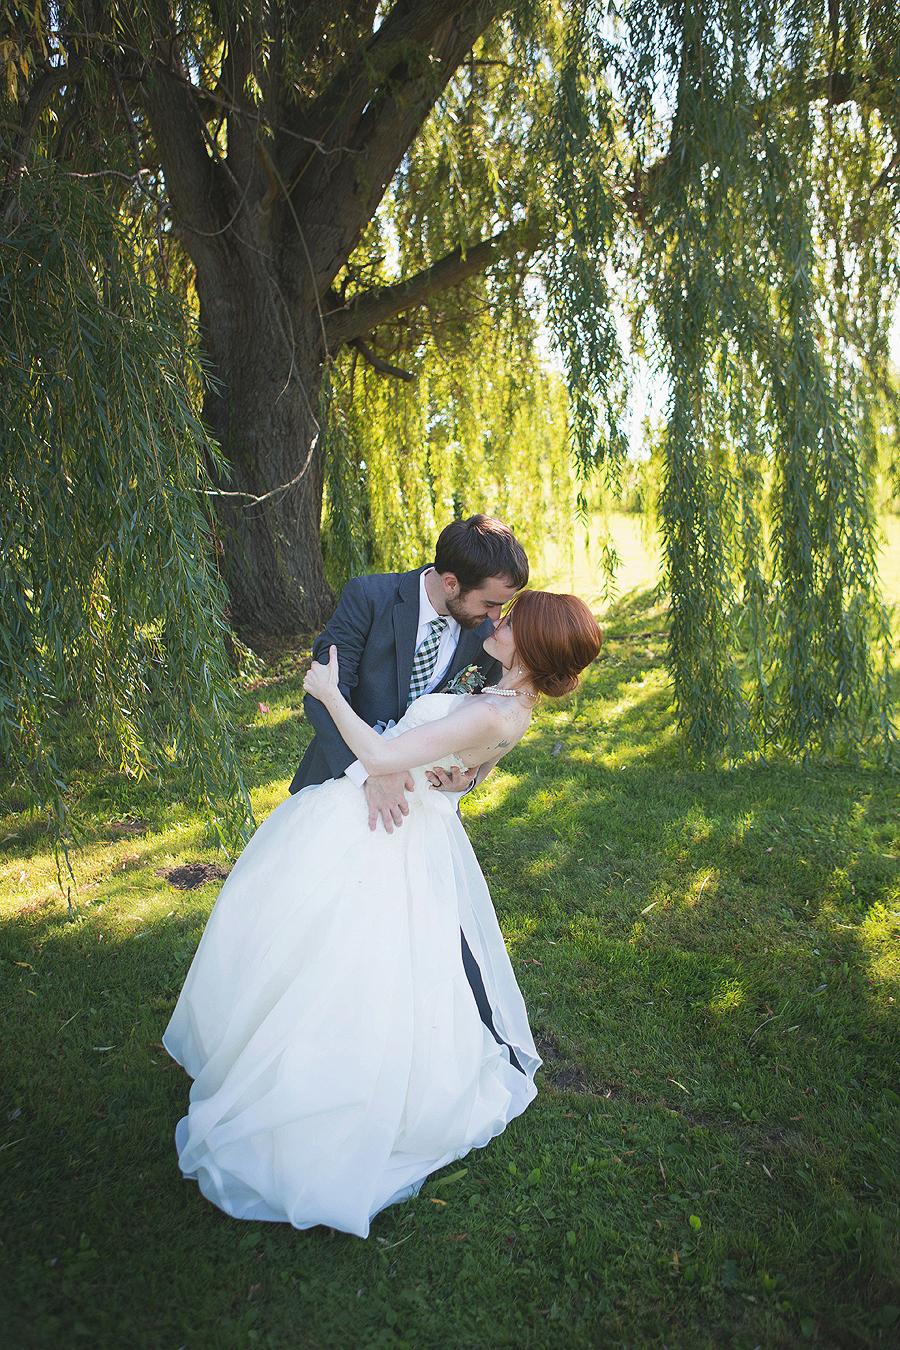 Toledo_Cleveland_Ohio_Wedding_Portrait_Photographer-35.jpg